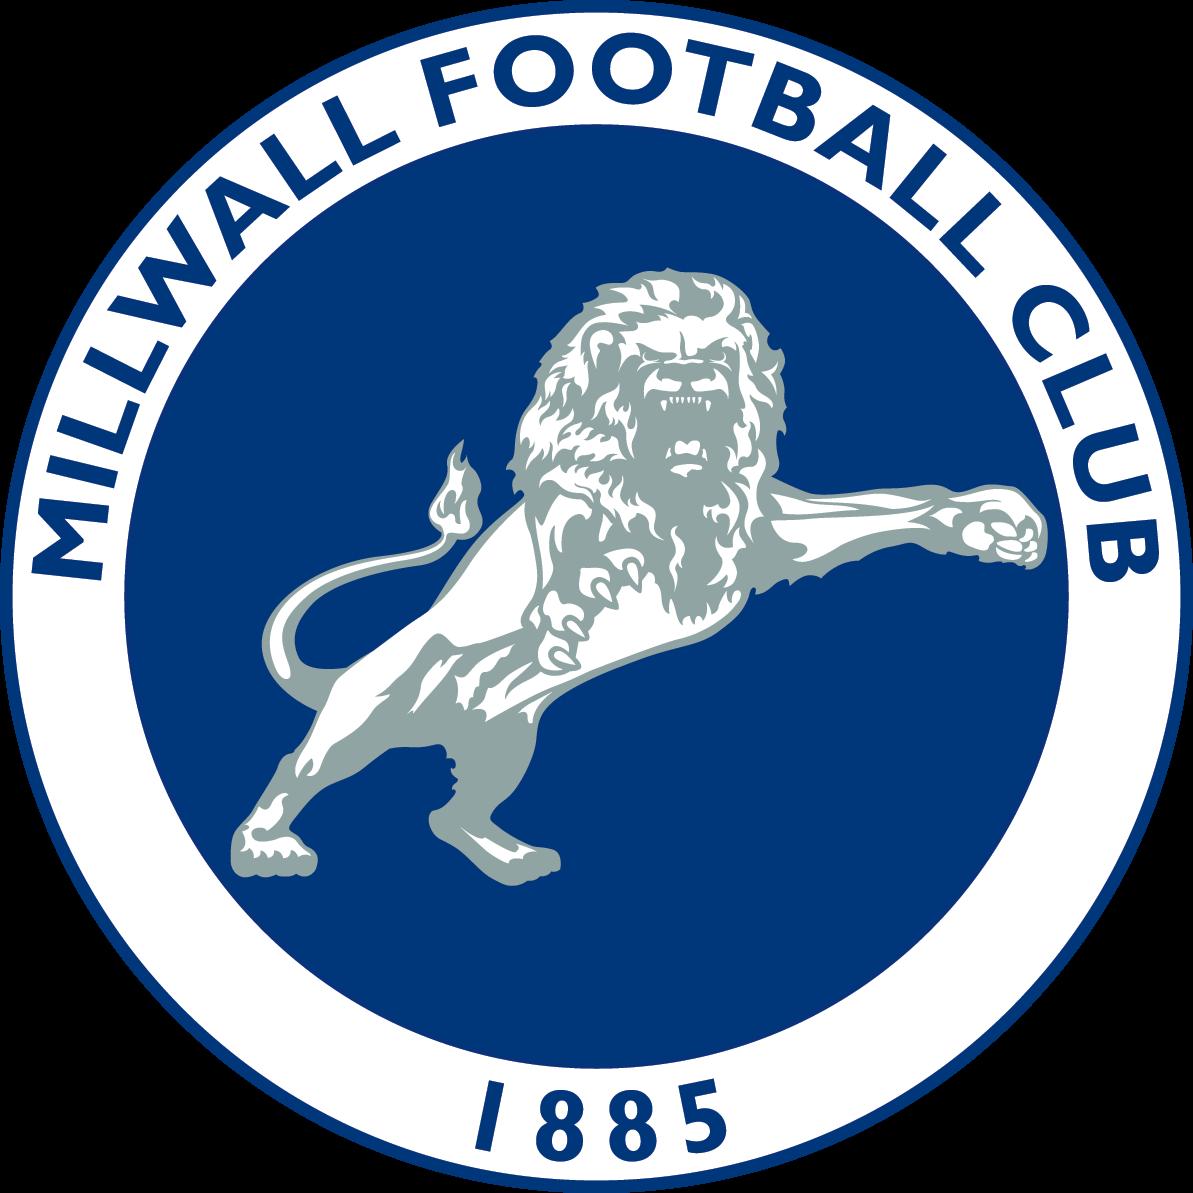 Millwall Vs Everton The42